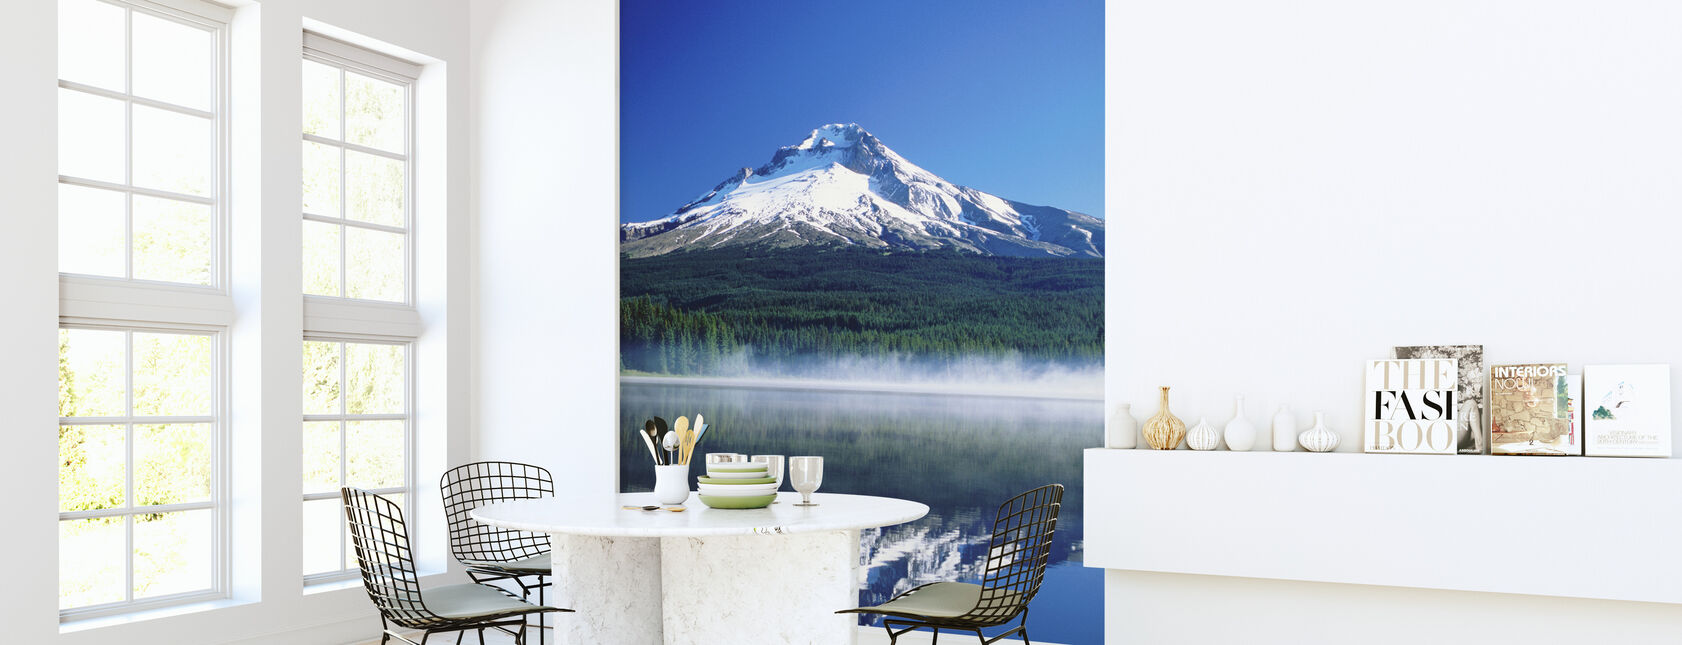 Trillium Lake in Oregon - Wallpaper - Kitchen